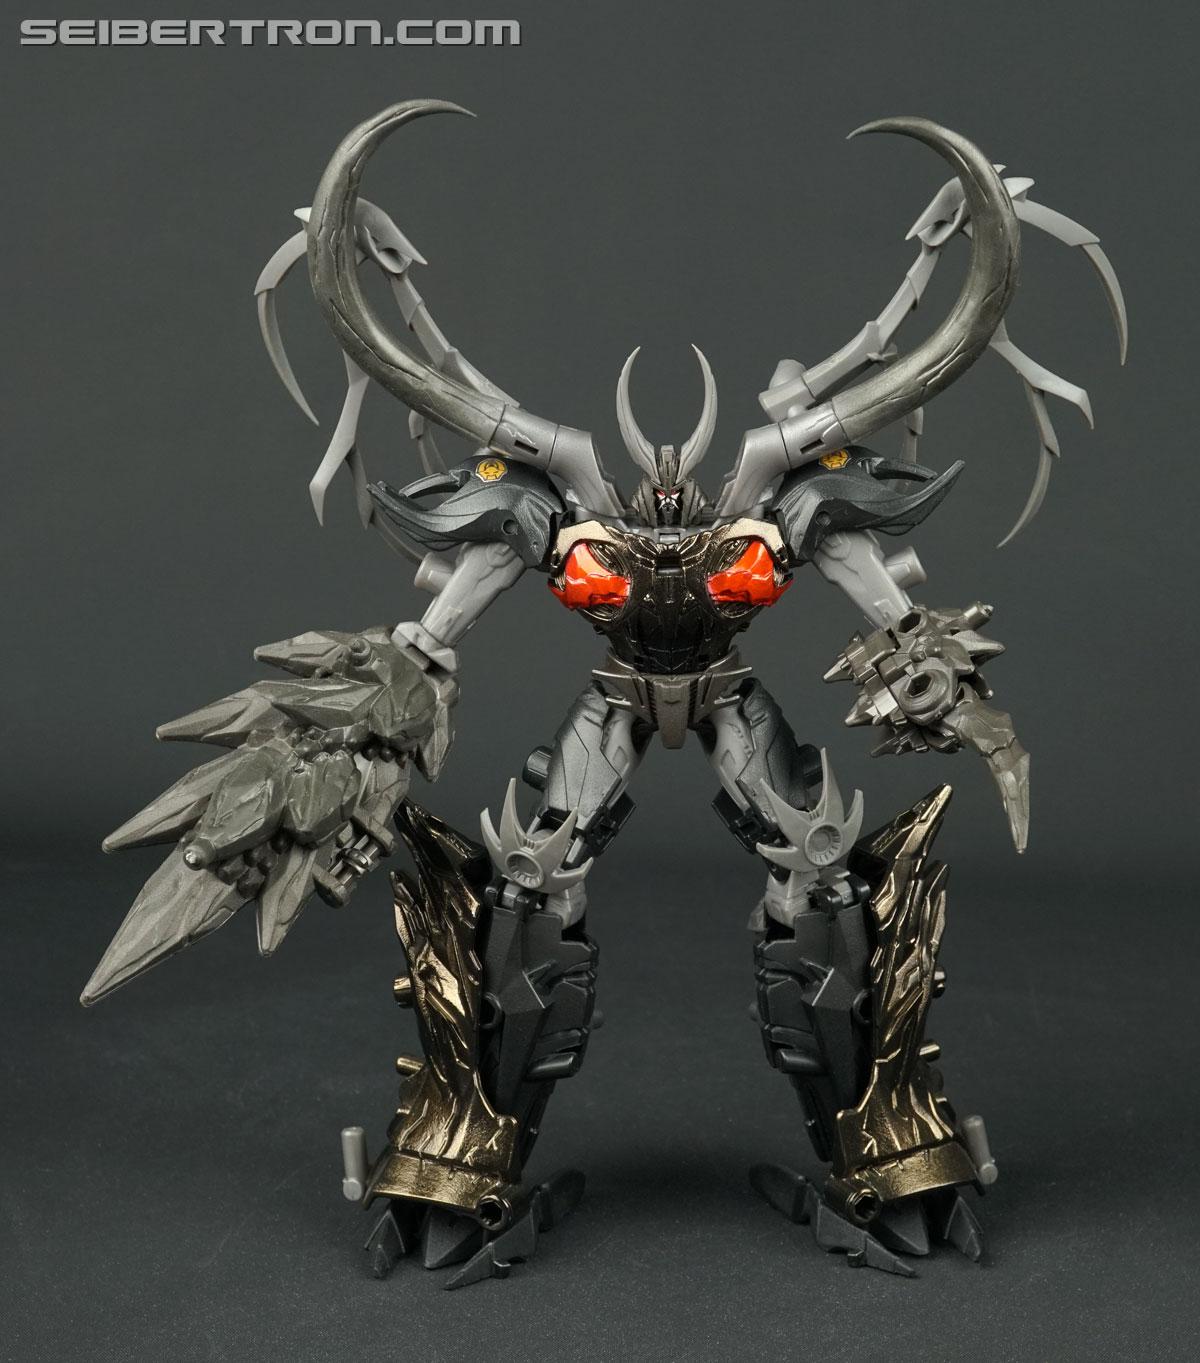 Transformers Arms Micron Nightmare Unicron (Image #121 of 156)